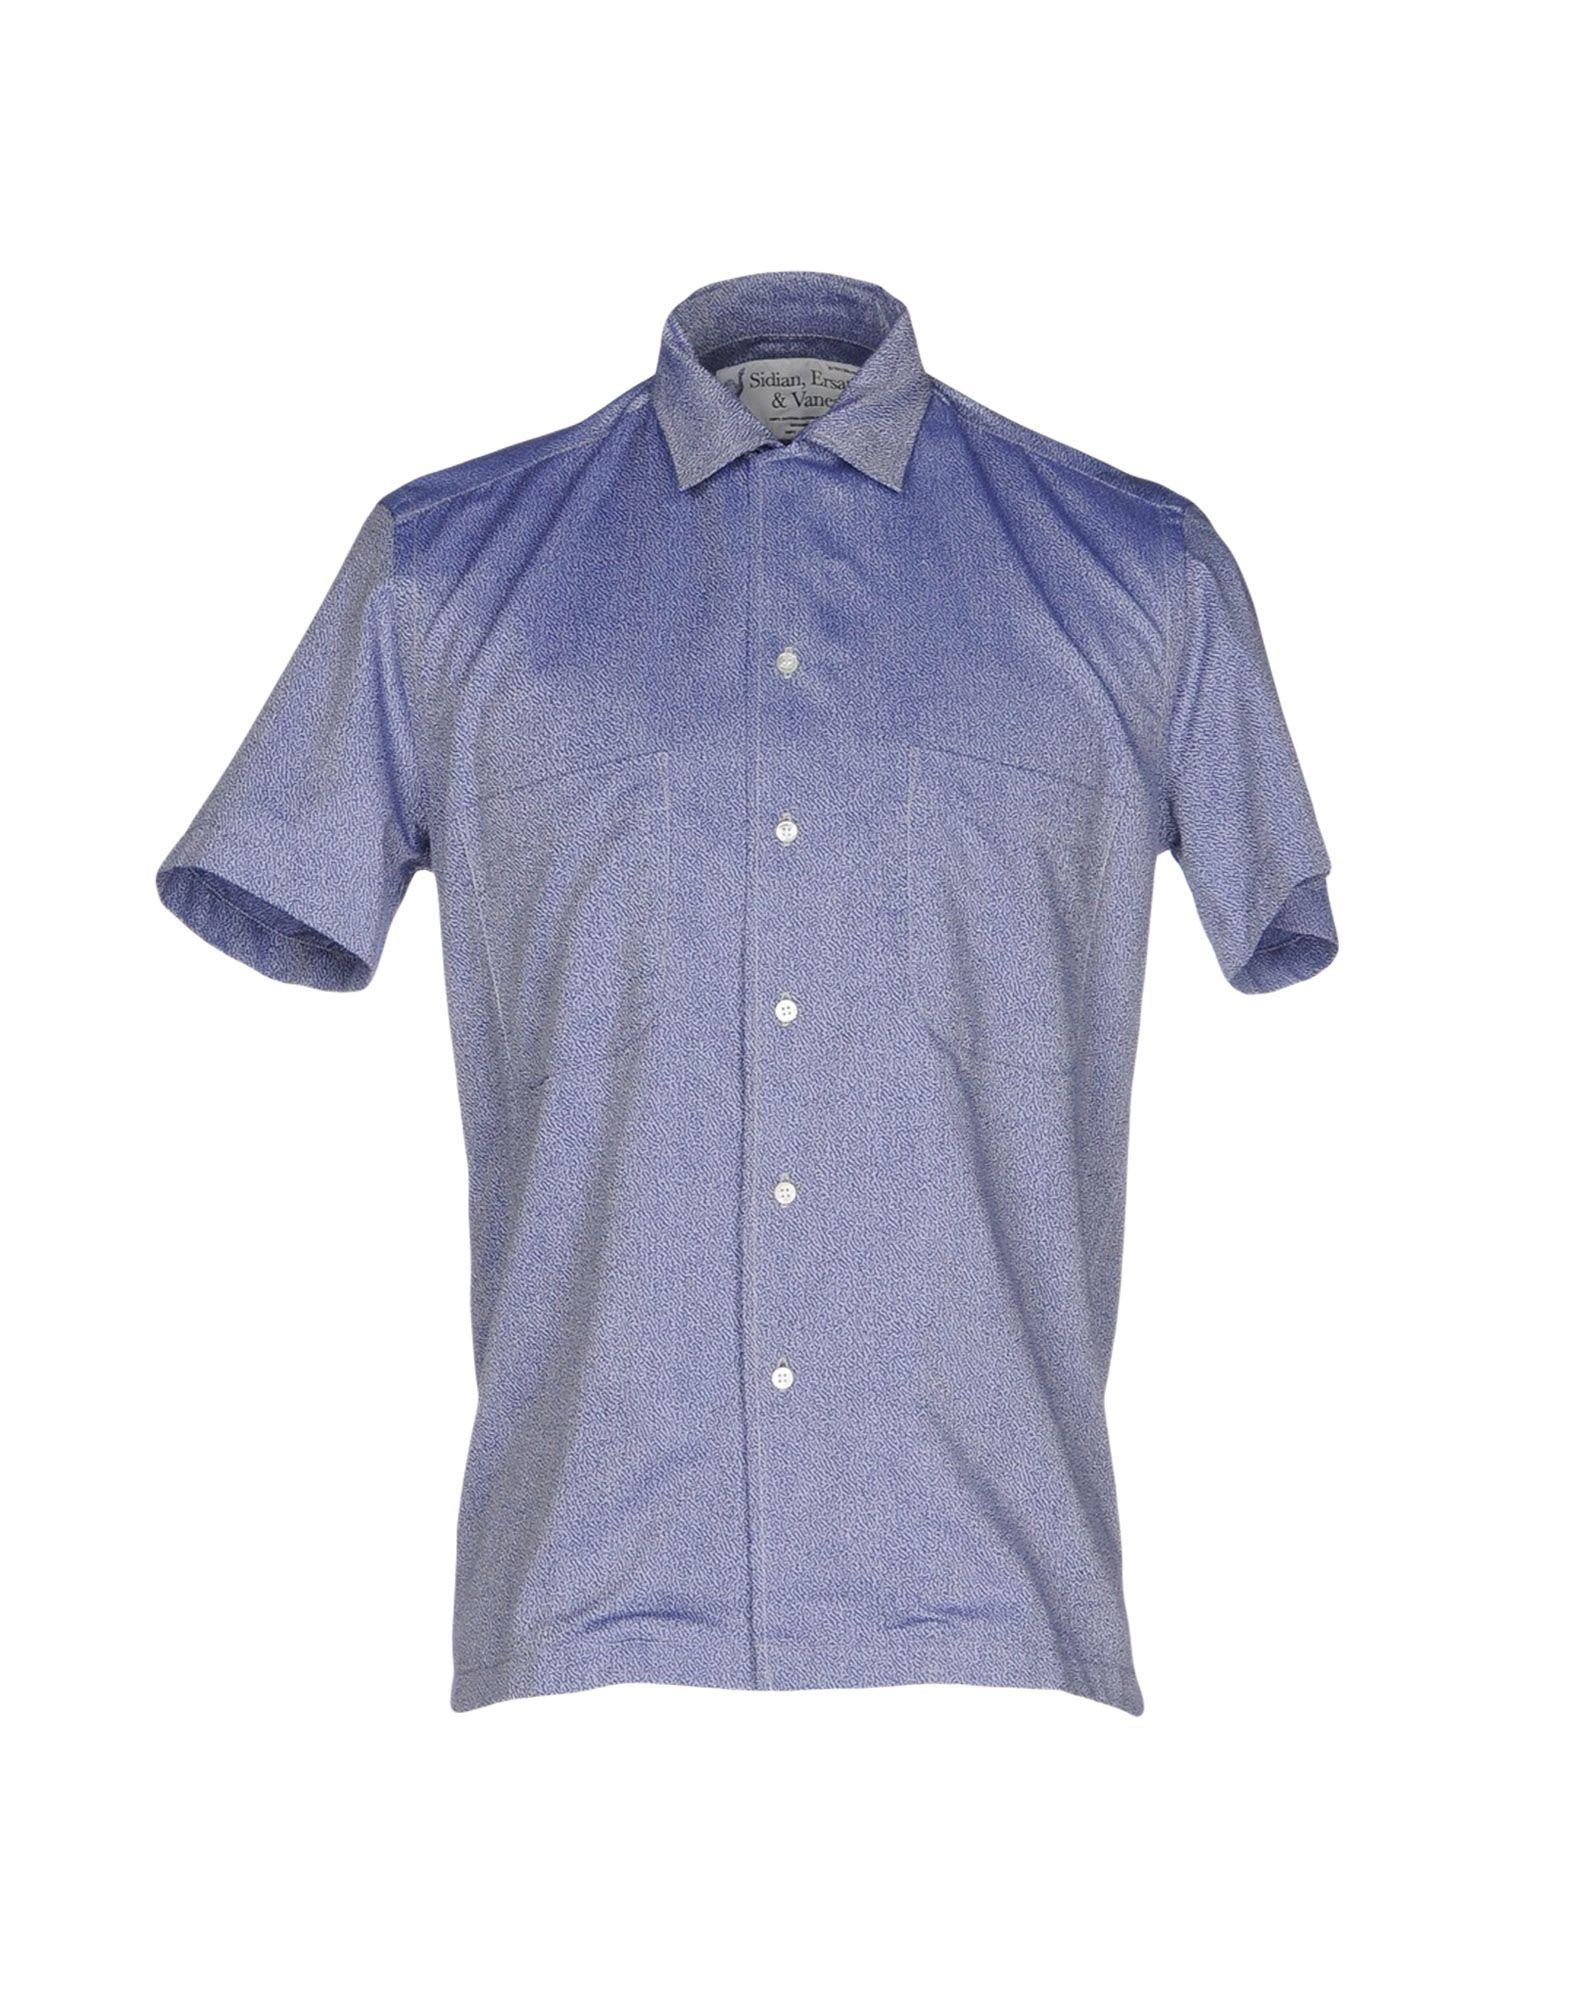 SIDIAN, ERSATZ & VANES Patterned Shirt in Blue